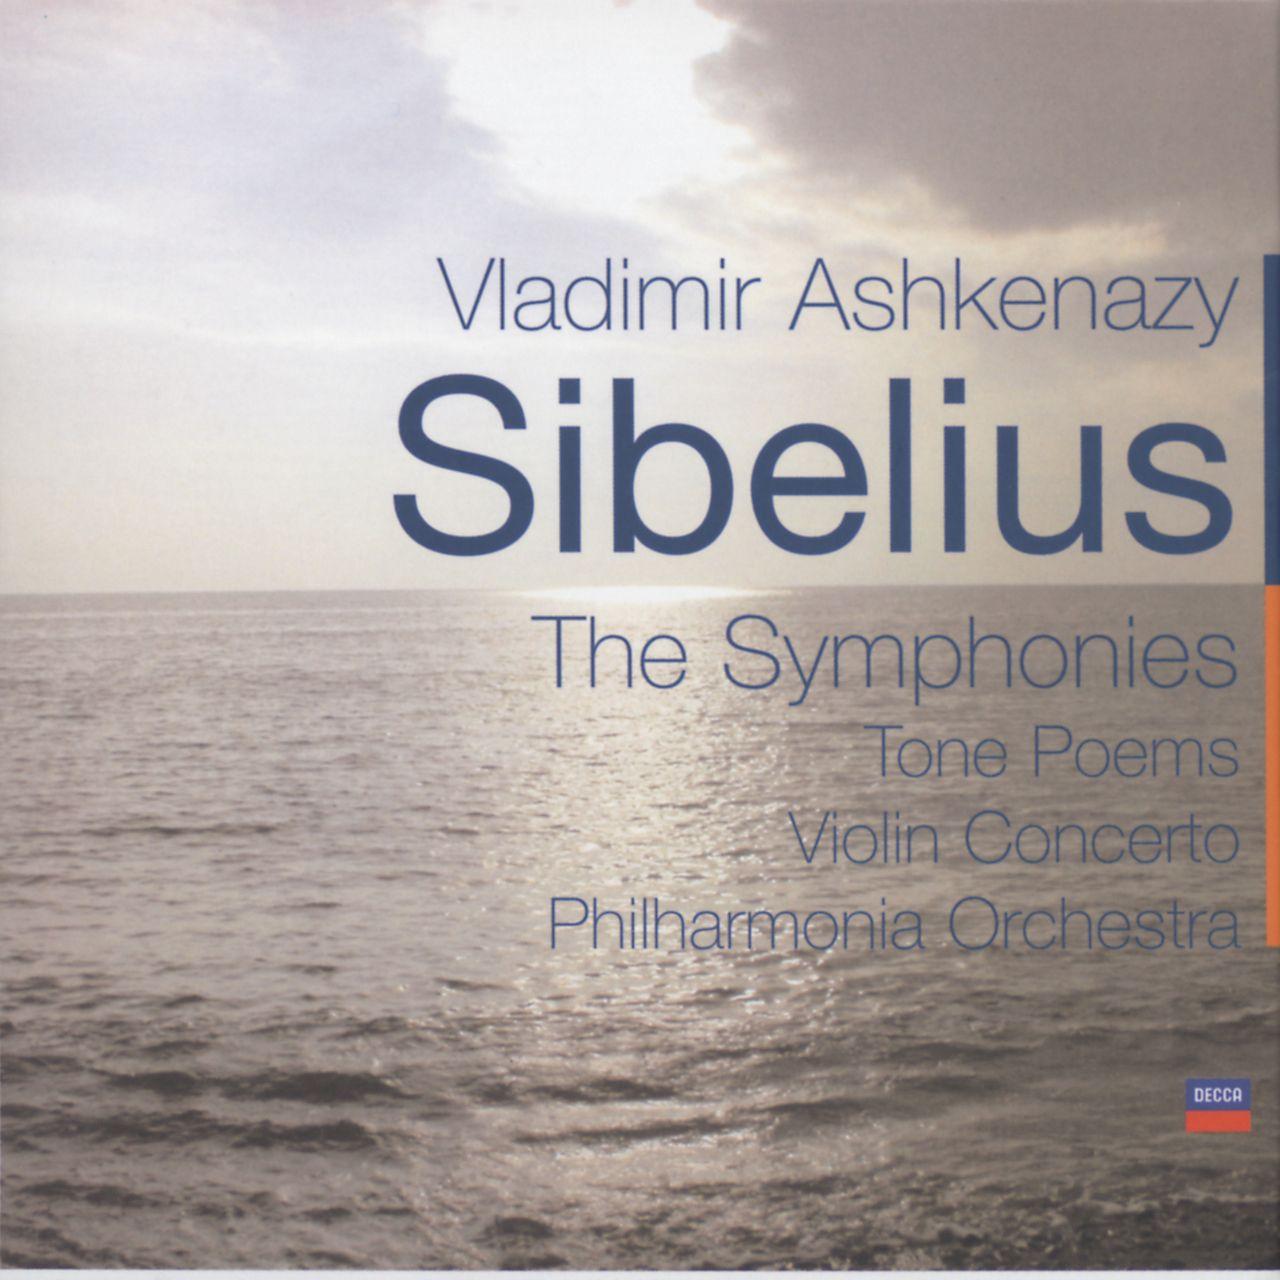 Philharmonia Orchestra / Vladimir Ashkenazy // Decca 473 5902 - Recorded 1982